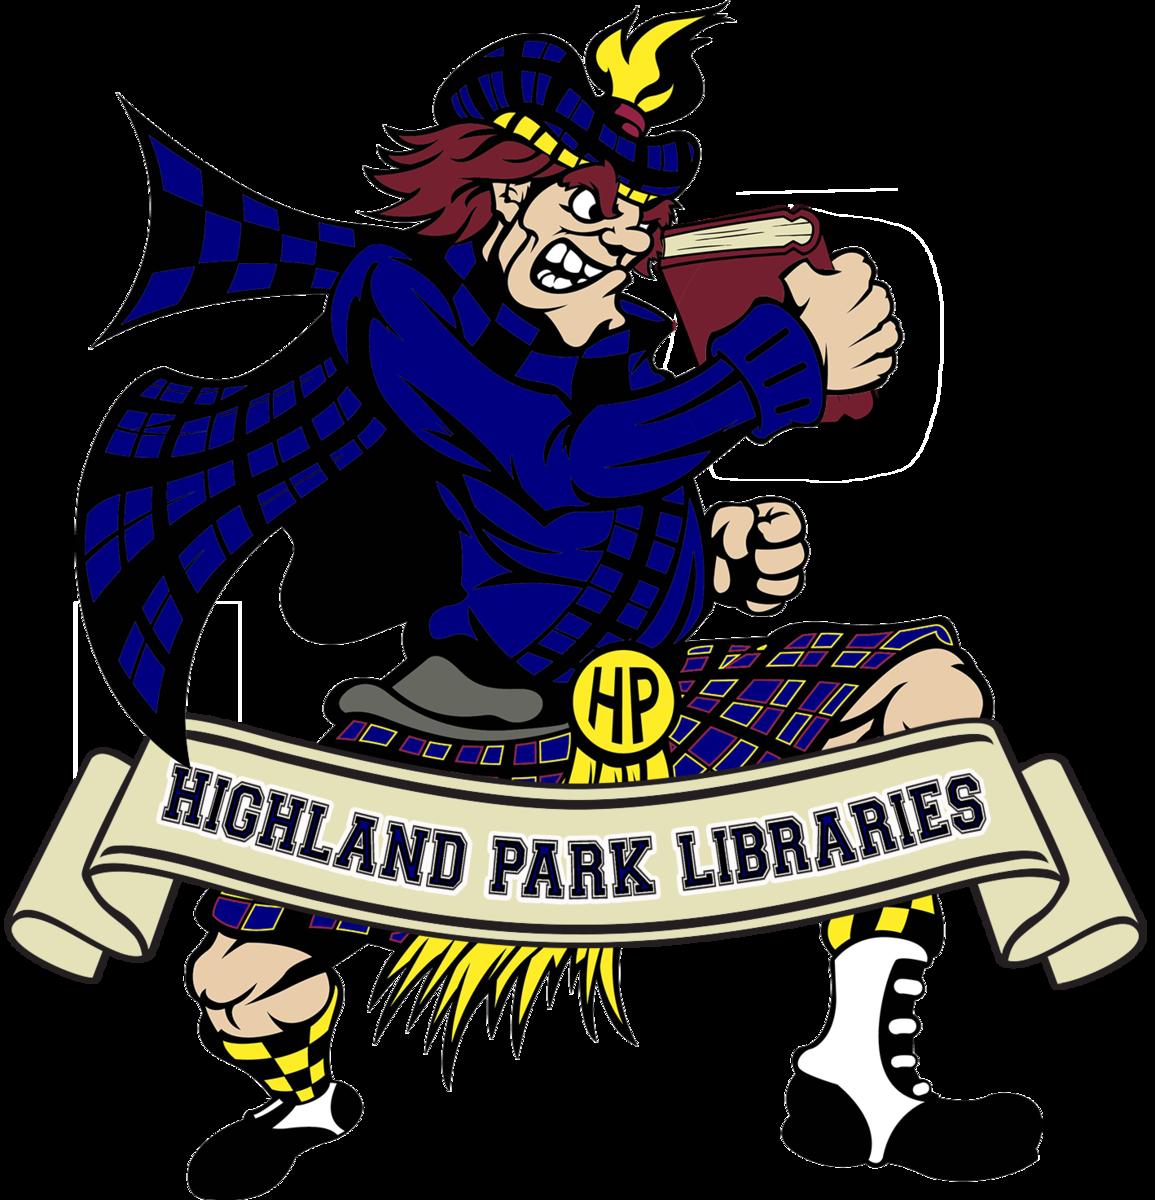 Highland Park ISD Libraries Mascot